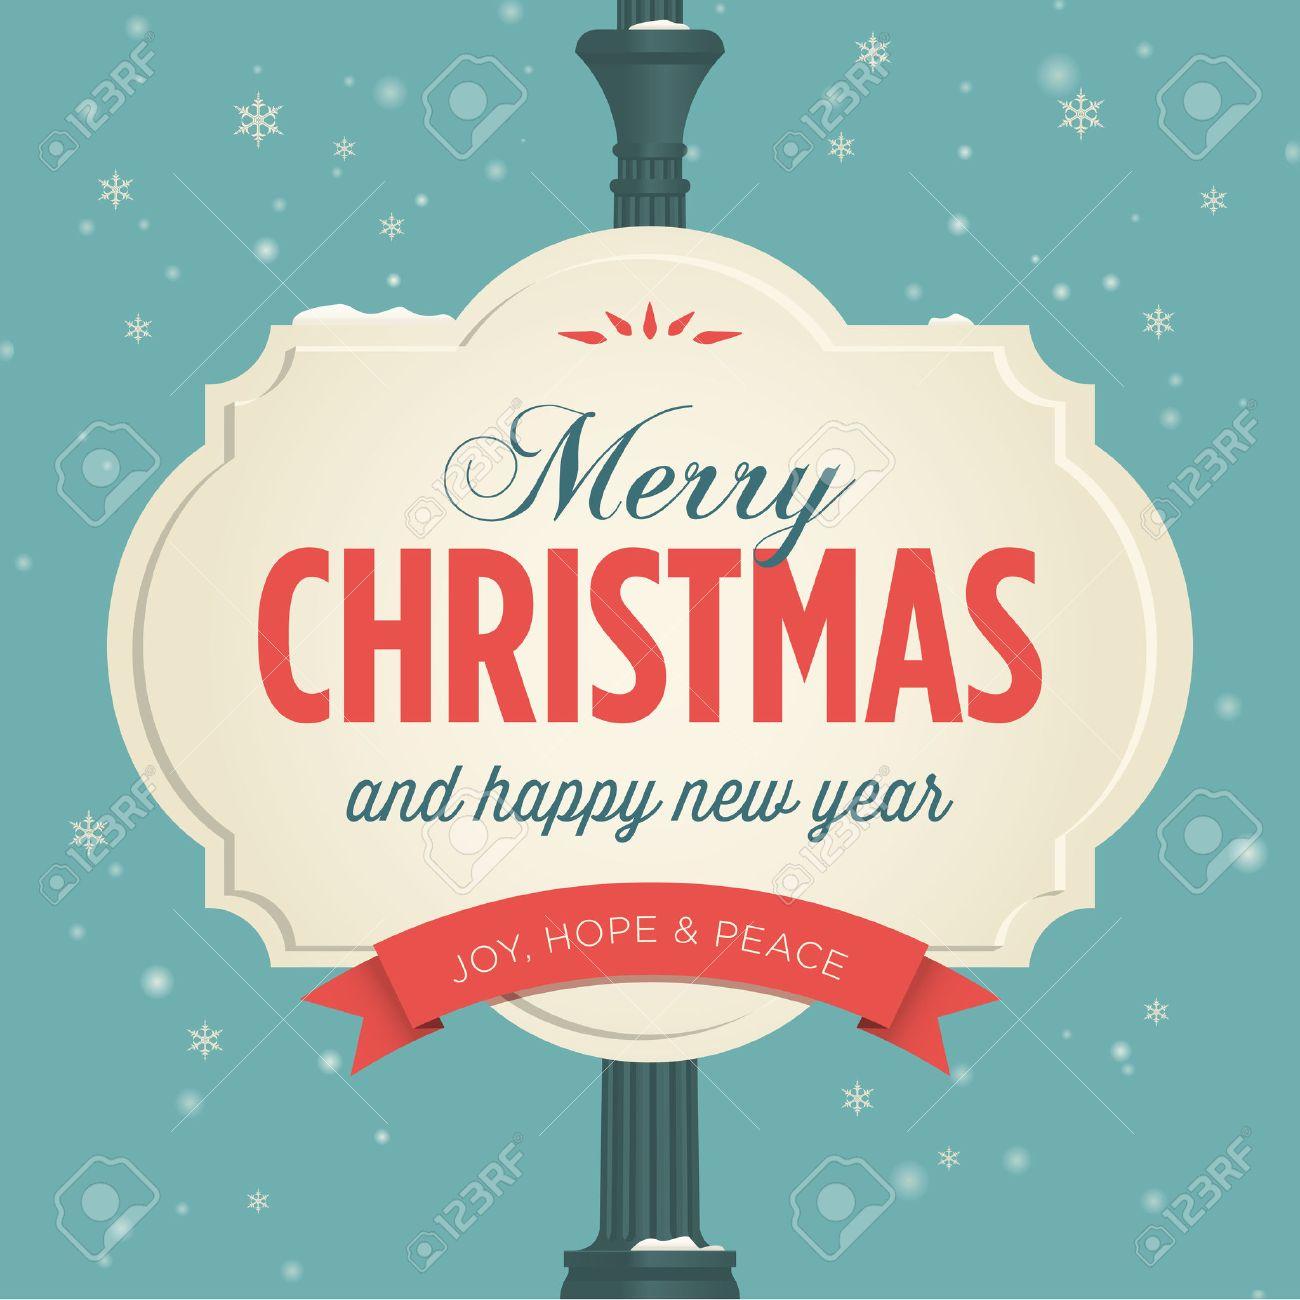 Merry Christmas Card Retro Vintage Royalty Free Cliparts, Vectors ...